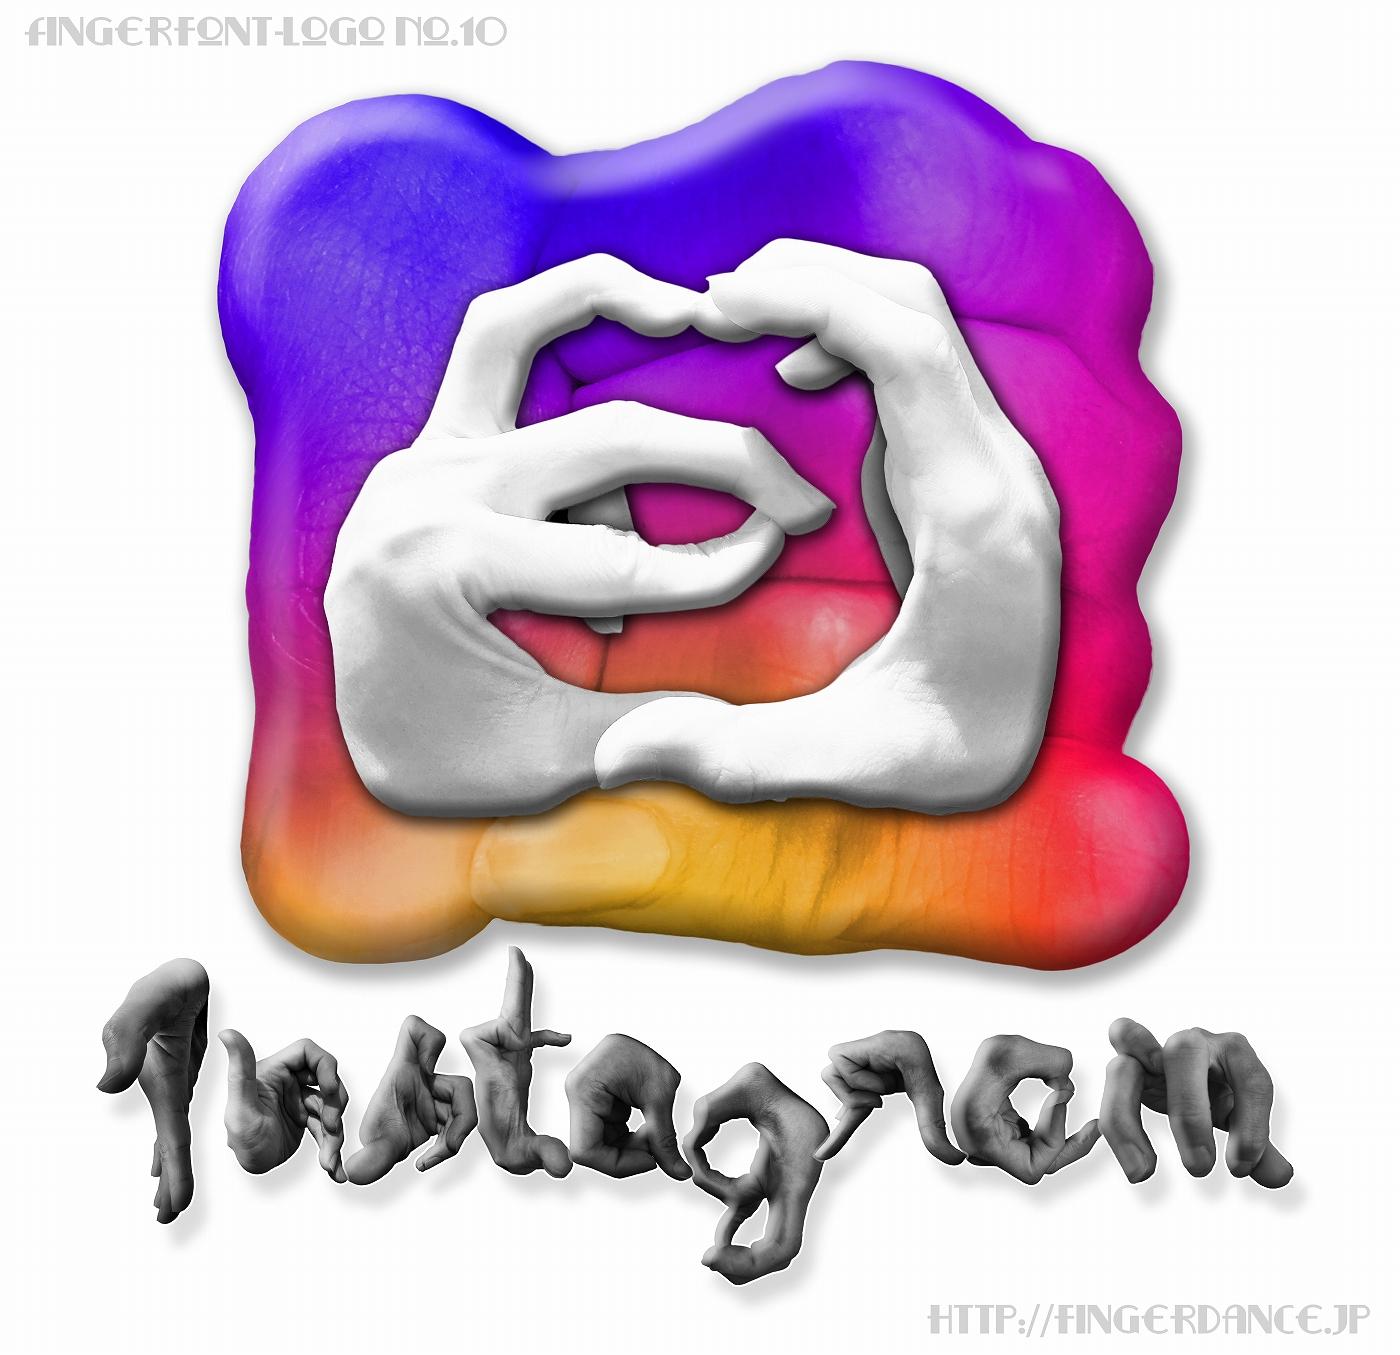 Instagram-fingerhttp://fingerdance.jp/L/logohand インスタグラム・フィンガーロゴハンド手指